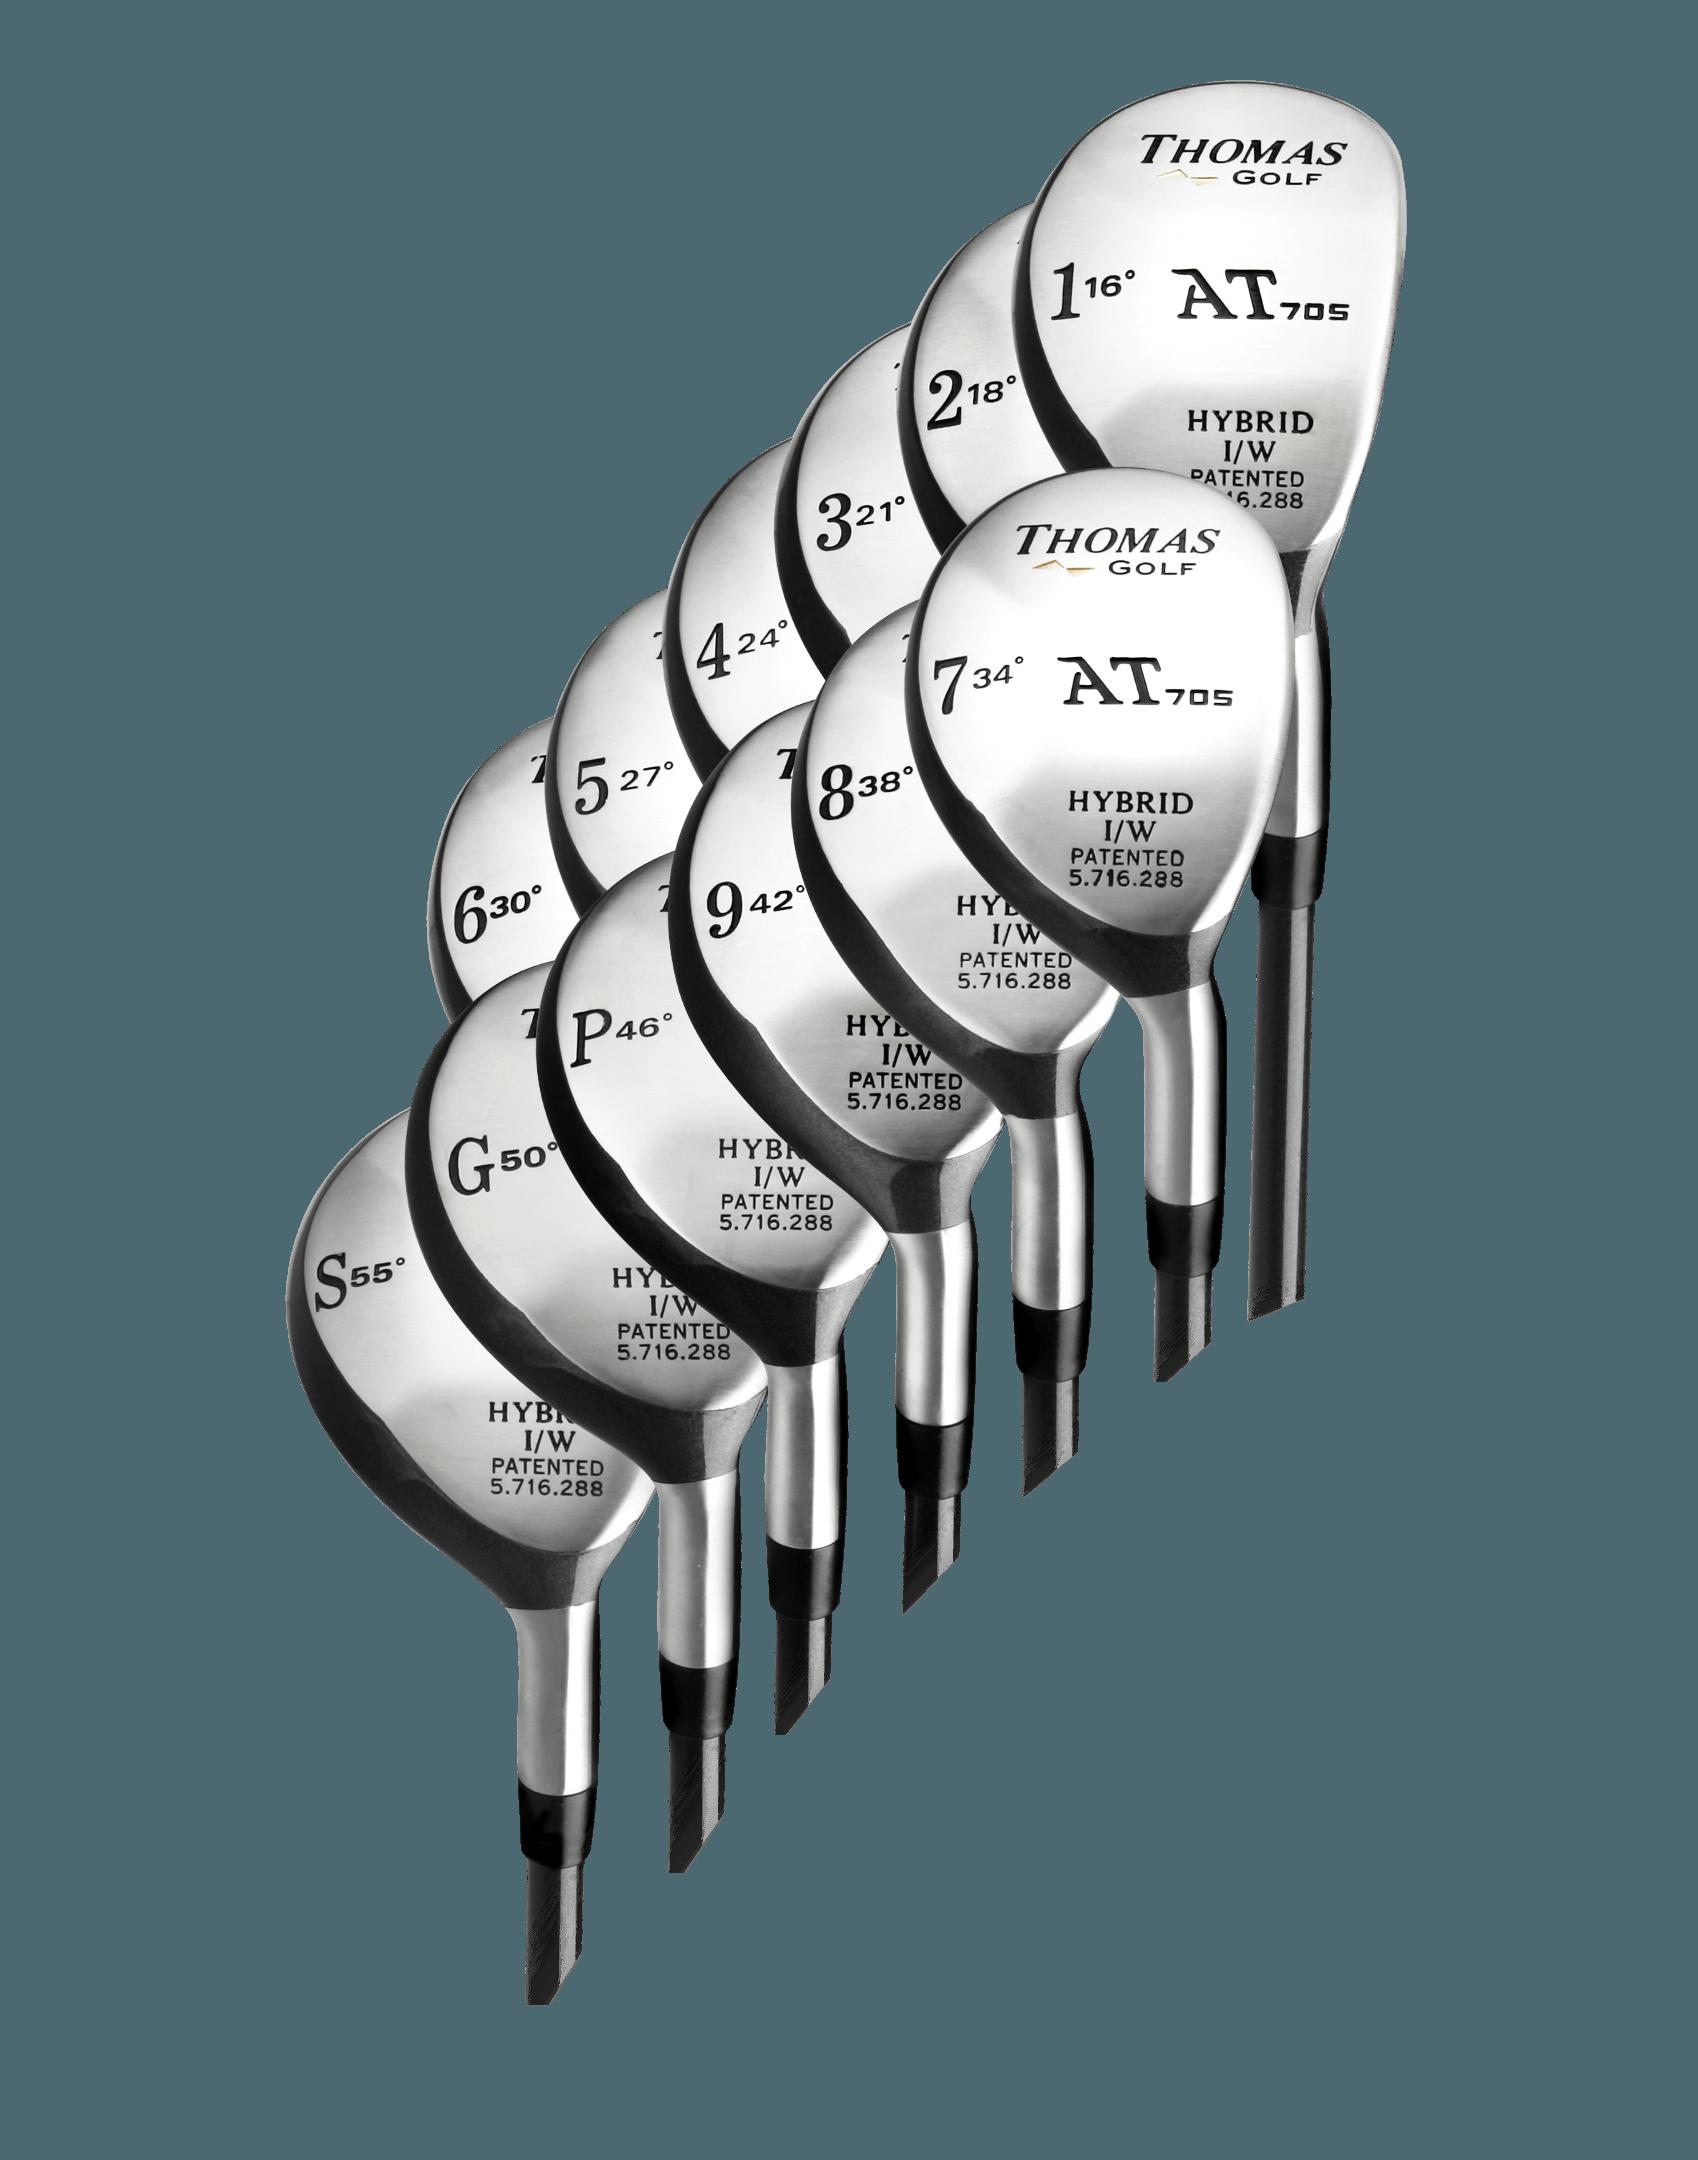 Thomas Golf Hybrids